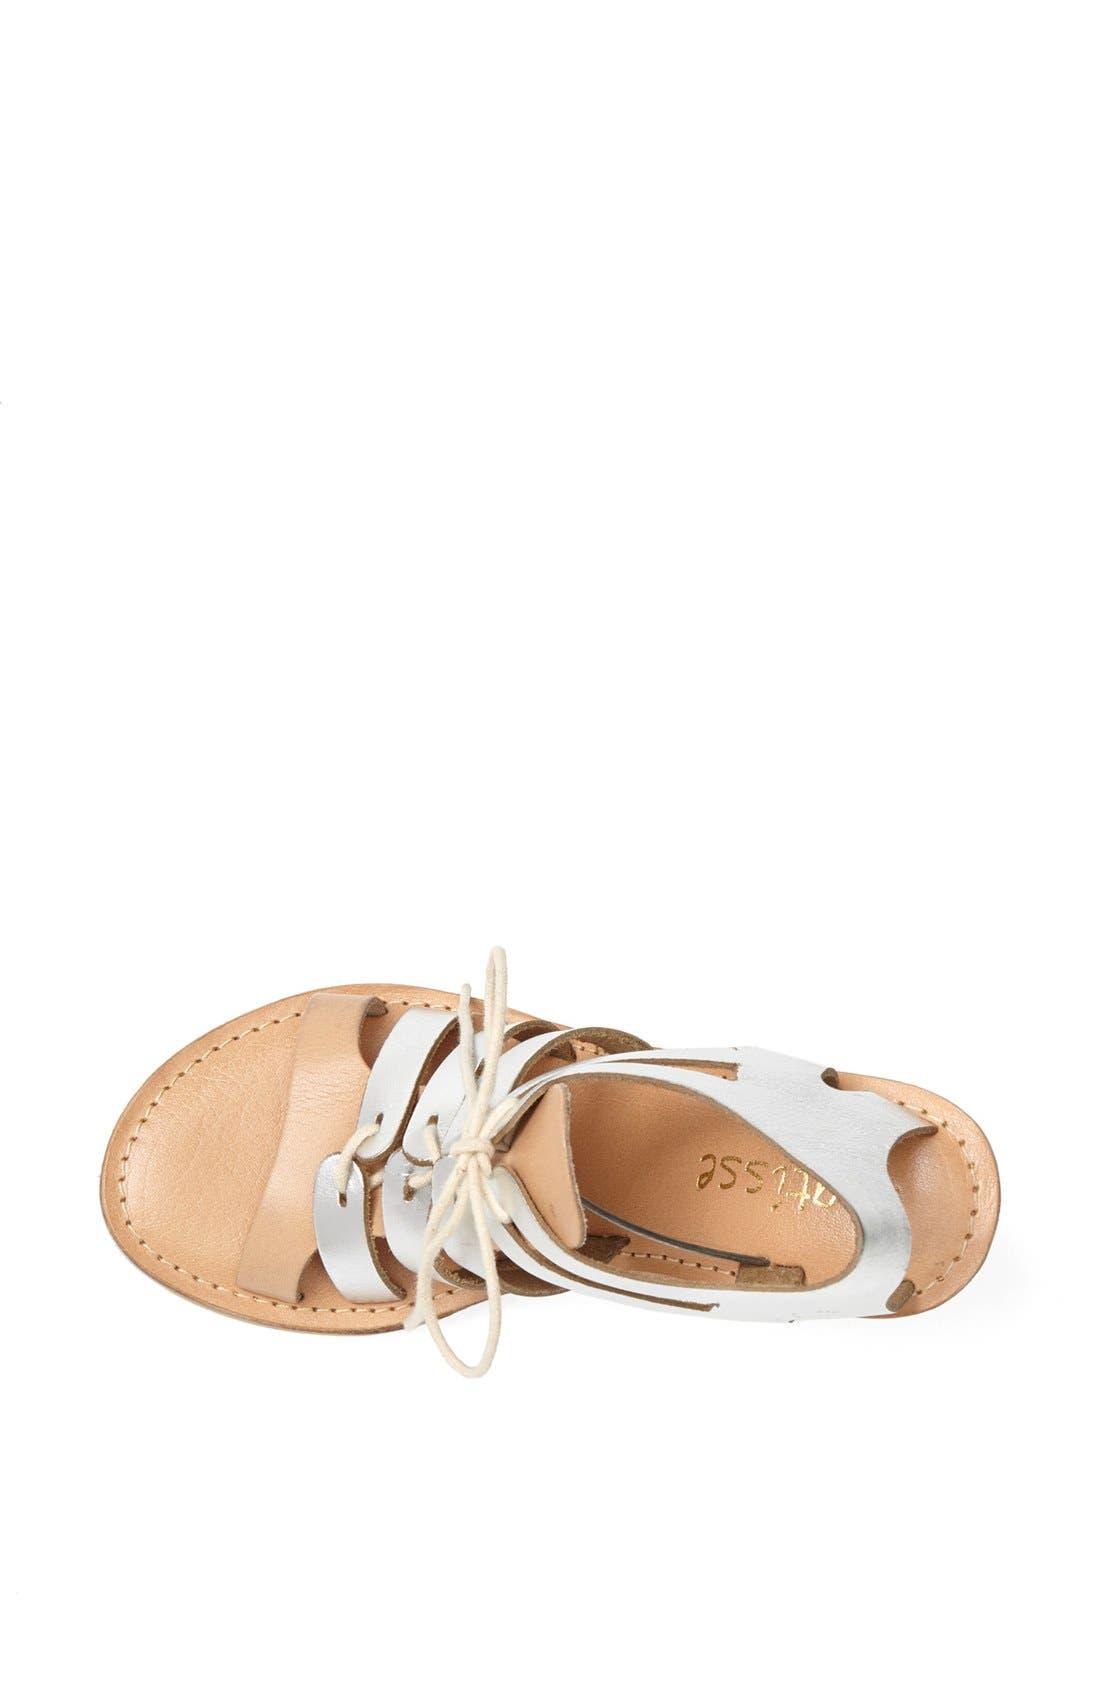 Alternate Image 3  - Matisse 'Begin' Metallic Leather Wedge Sandal